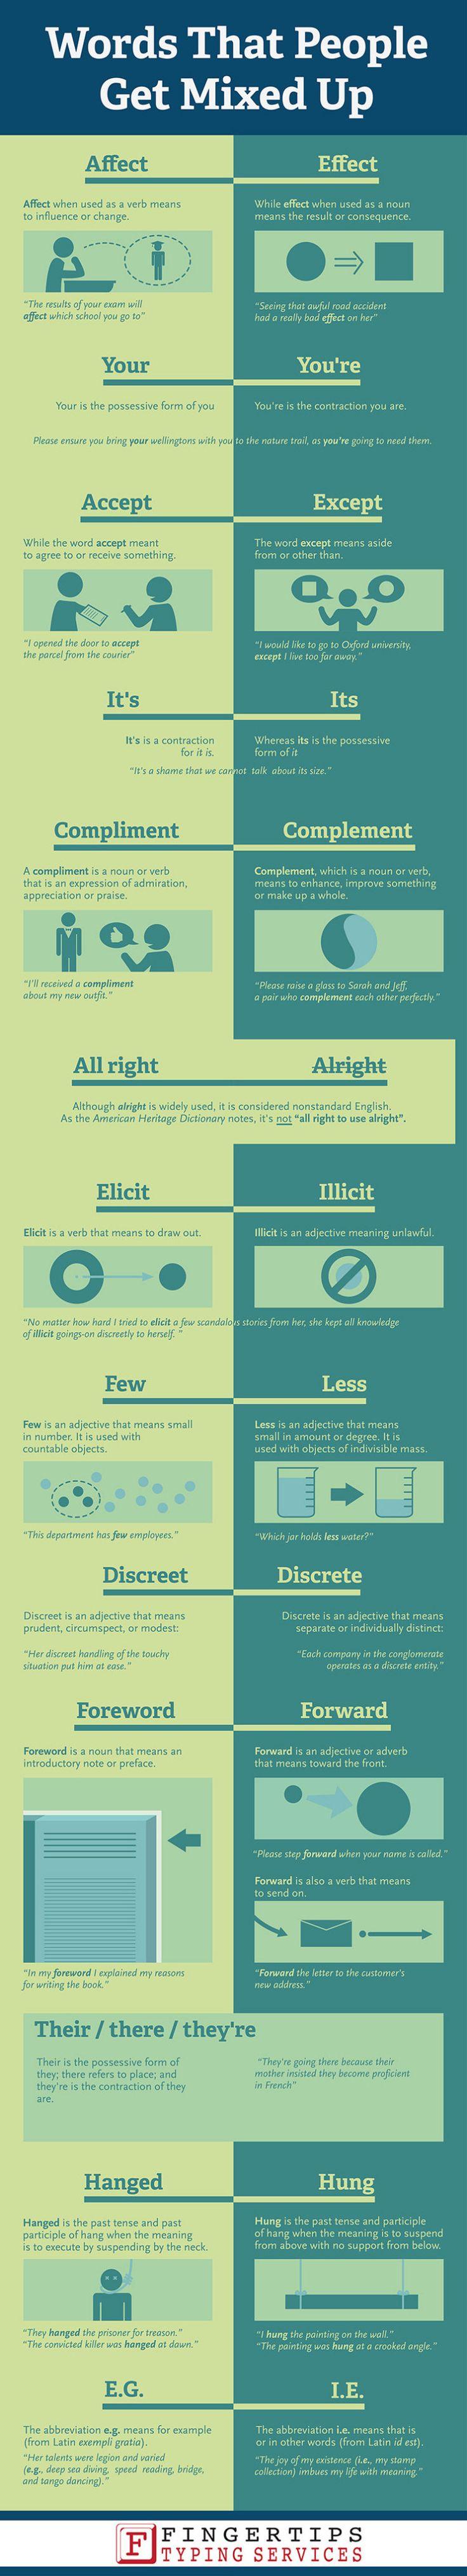 168 best homeschool grammar images on Pinterest | English grammar ...